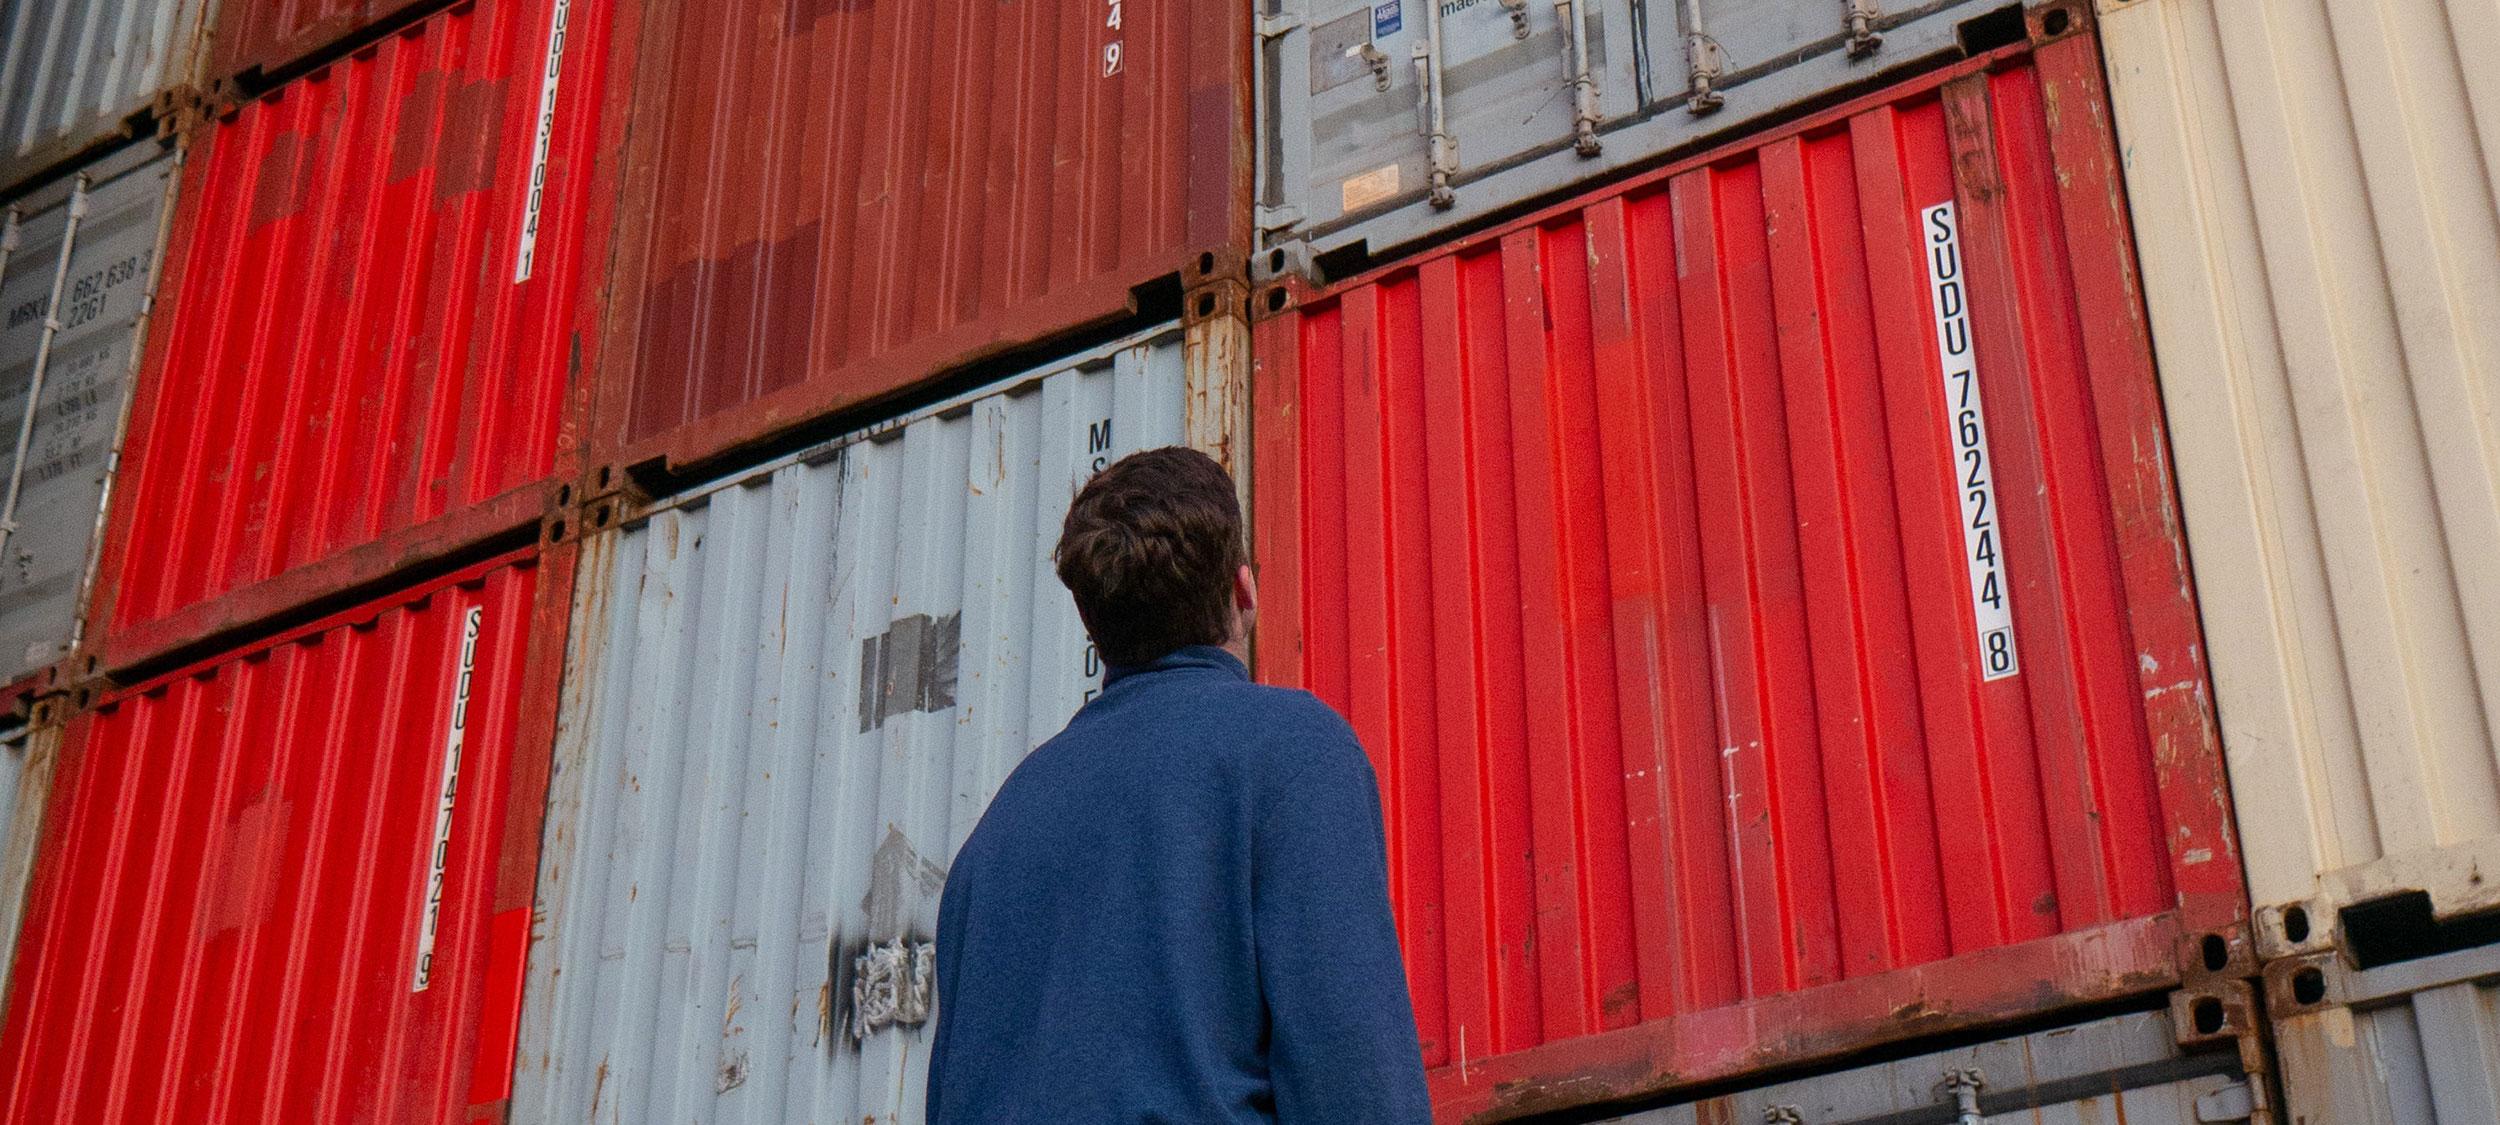 export 出口 / import 進口